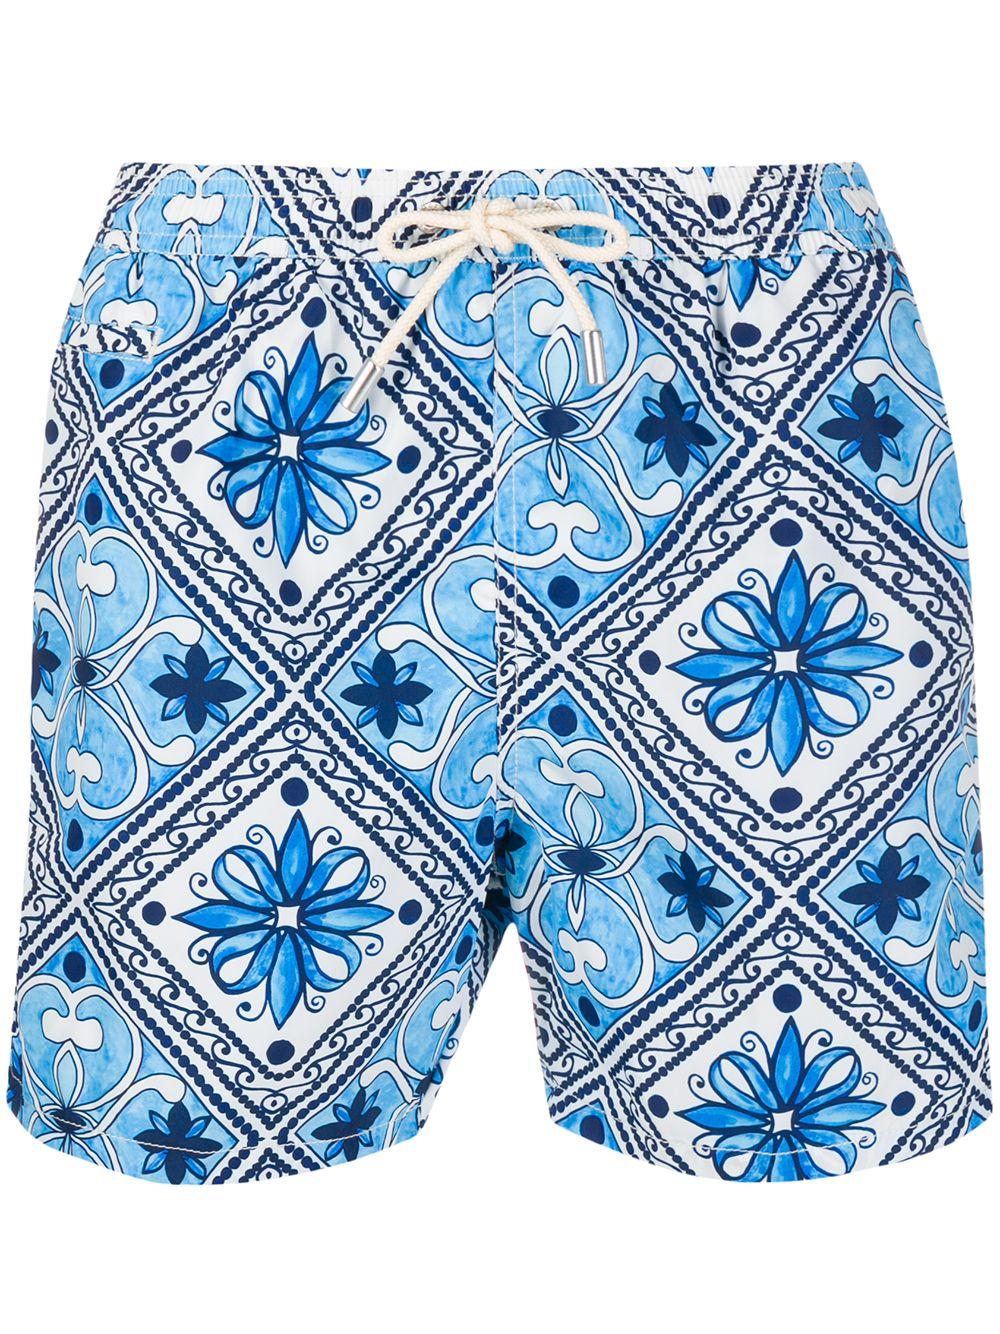 multi-coloured recycled polyester tile print swim shorts MC2 |  | LIGHTING-ITALIAN MAIOLICA01